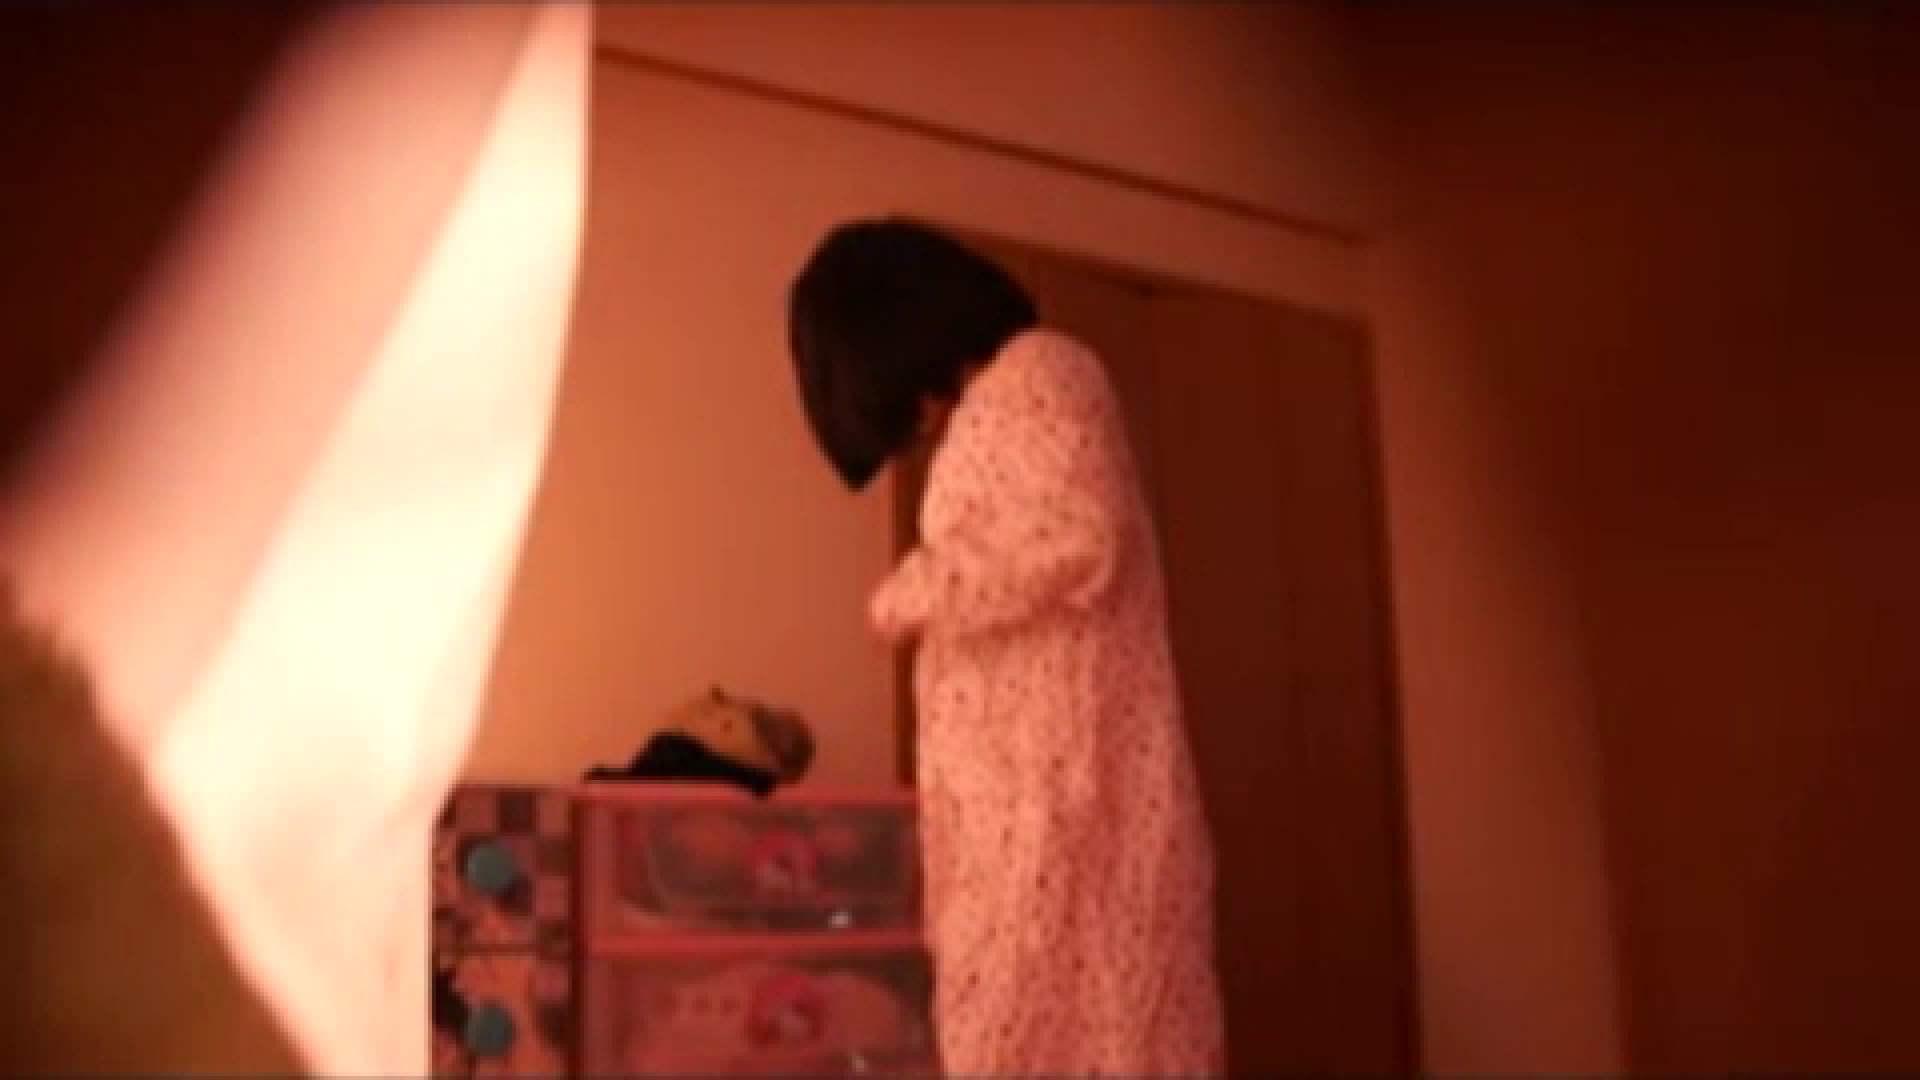 vol.2 まりこさんのお着替え、就寝前の映像です。 エッチすぎるOL達 | 着替えシーン  29連発 19